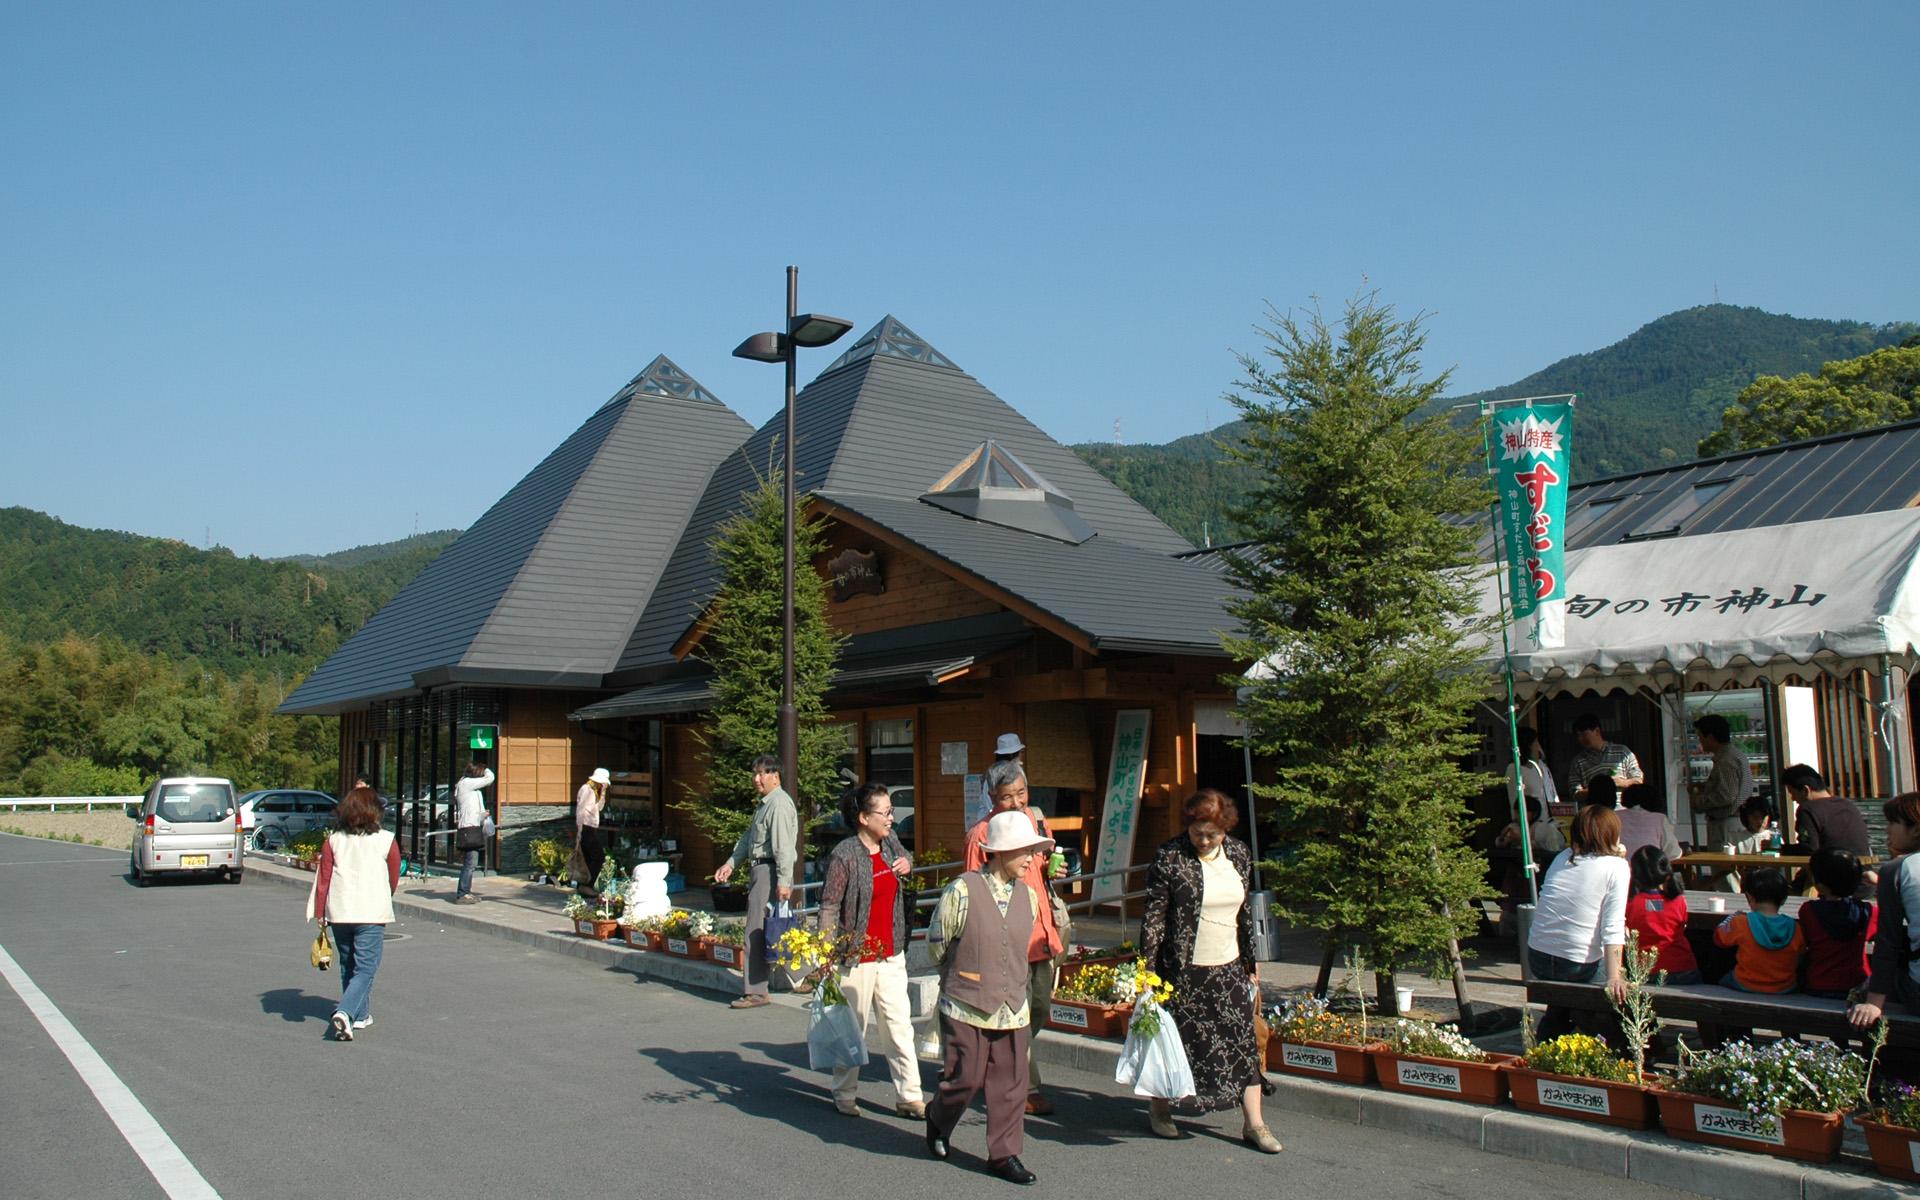 道の駅「温泉の里 神山」